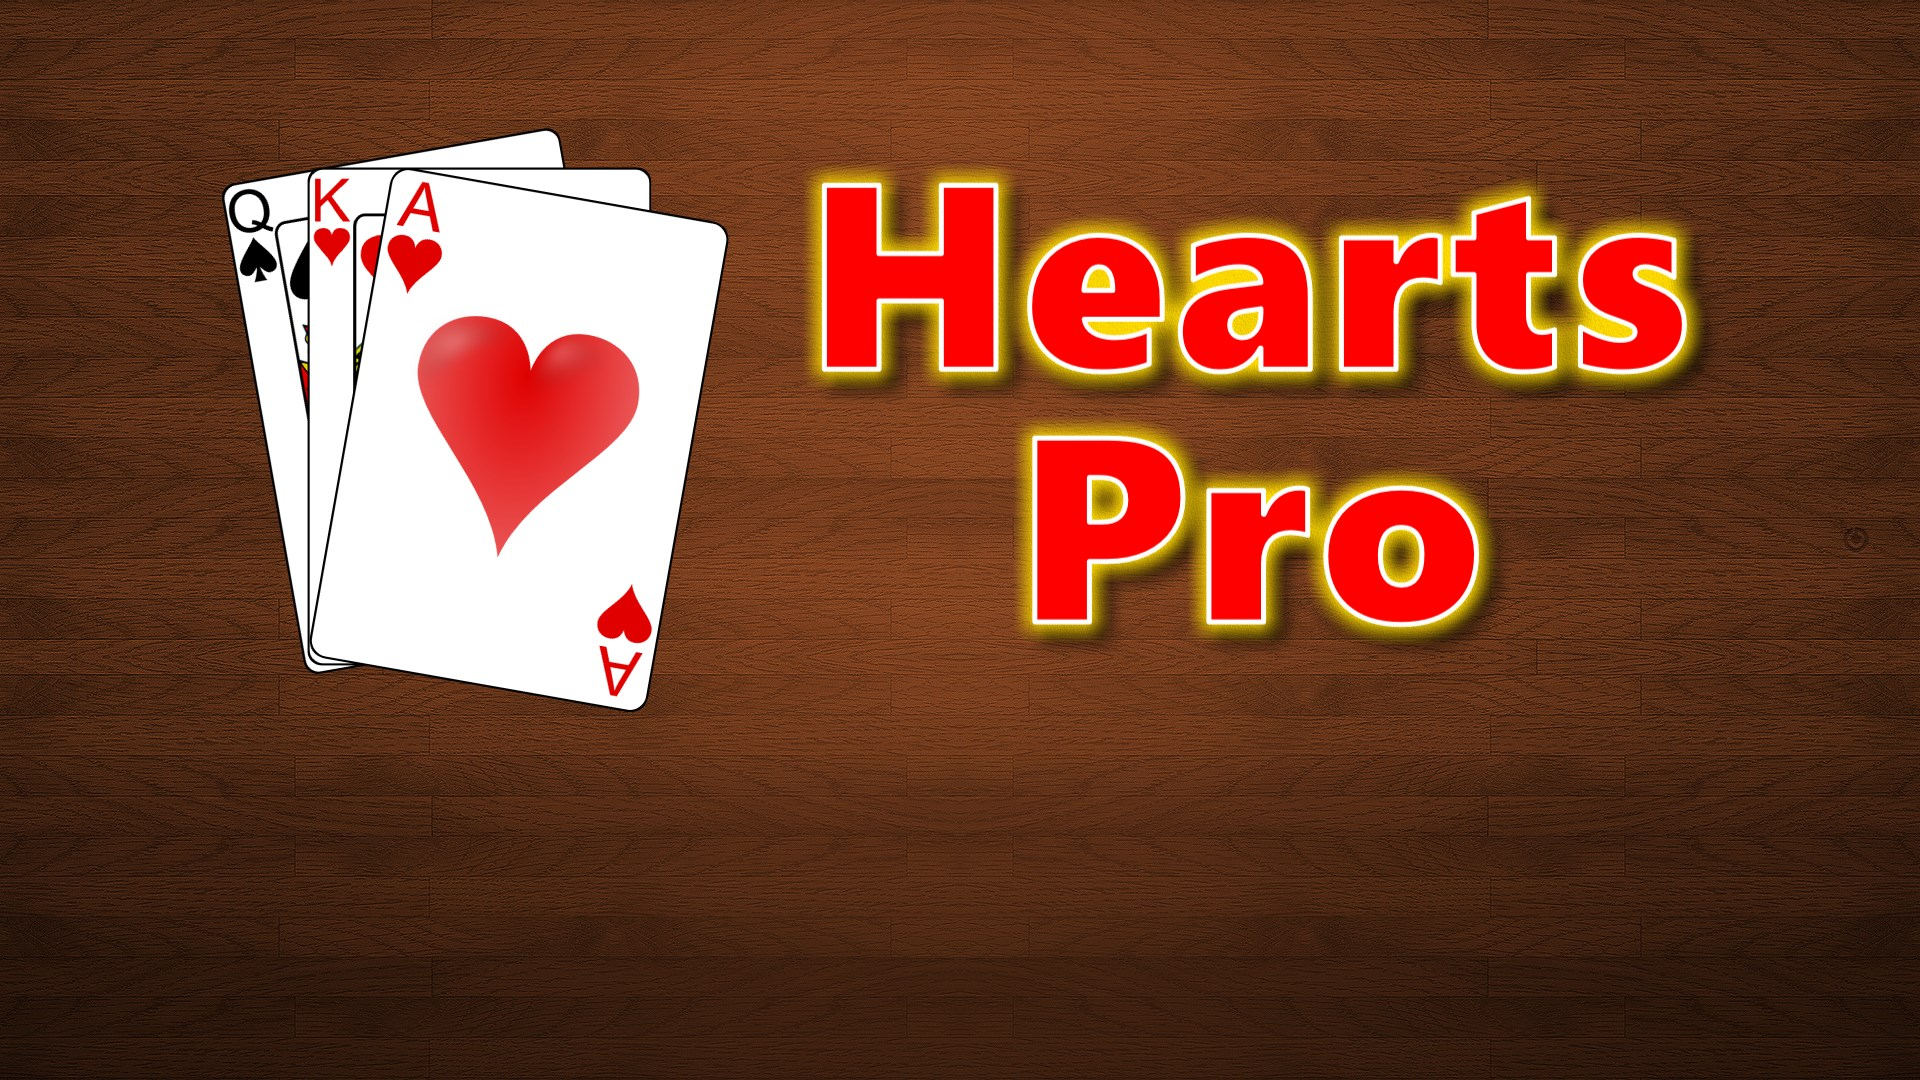 microsoft hearts card game free download windows 7